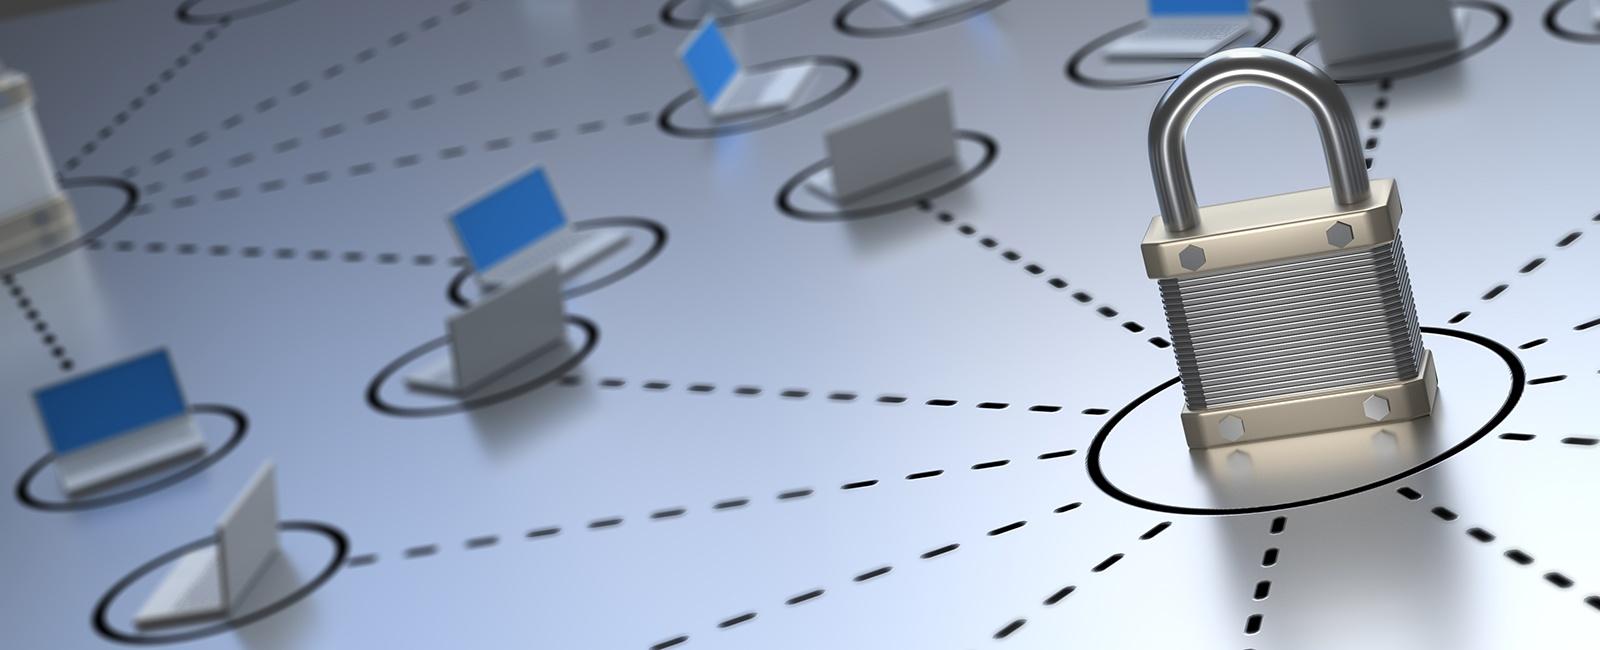 three-ways-to-improve-your-ip-network-security.jpg